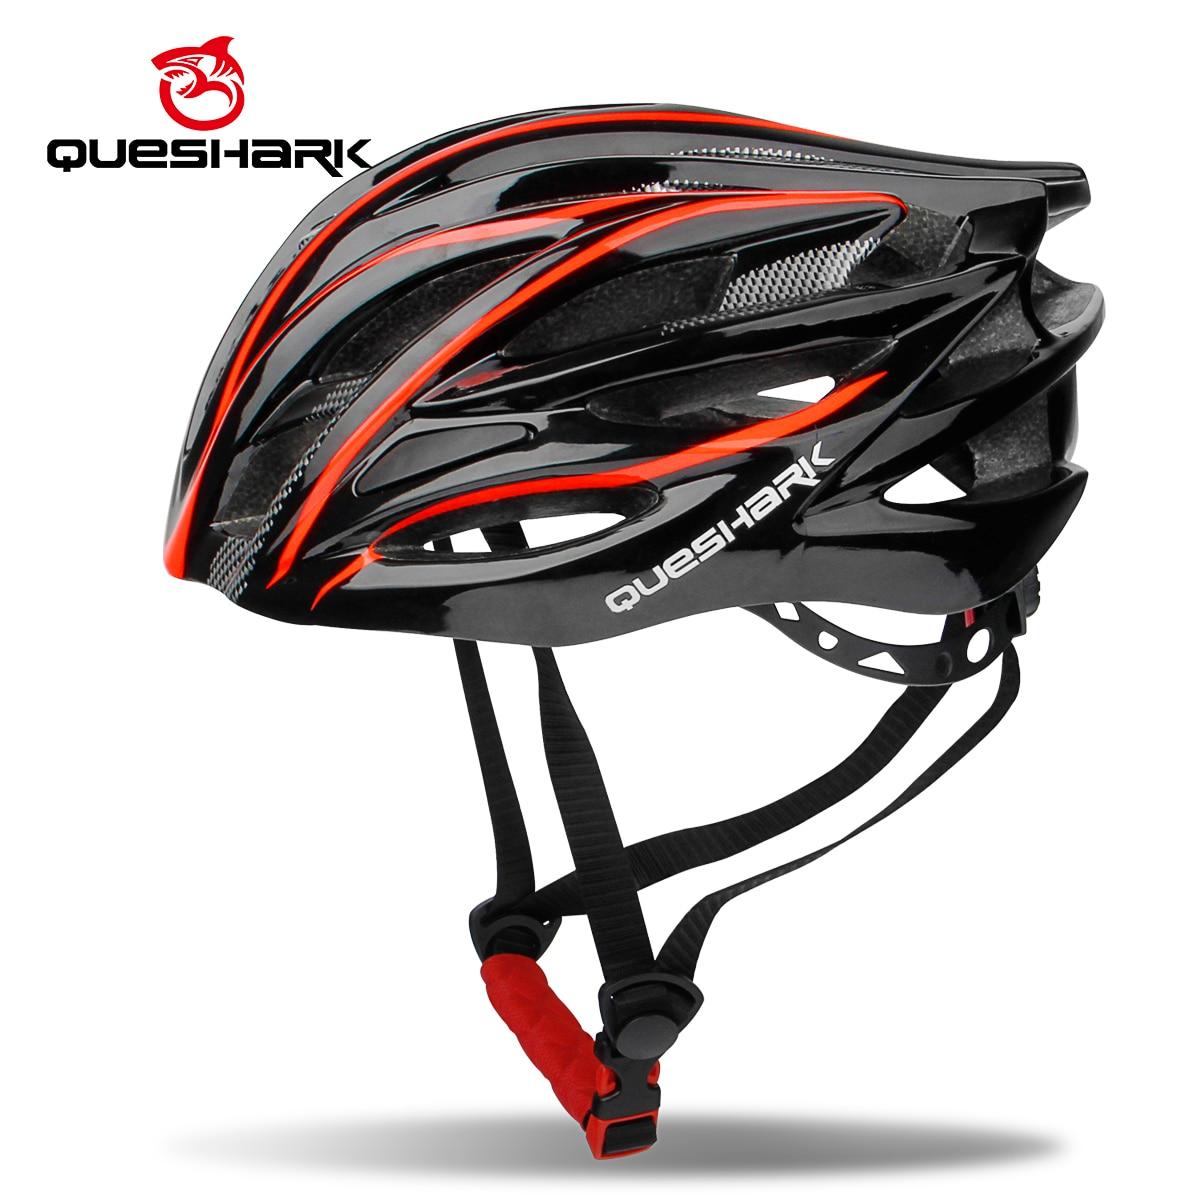 QUESHARK Men Women Air Vents Bicycle Helmet Ultralight Riding Cycling Helmets Mountain Road Bike Helmets For Head Safety